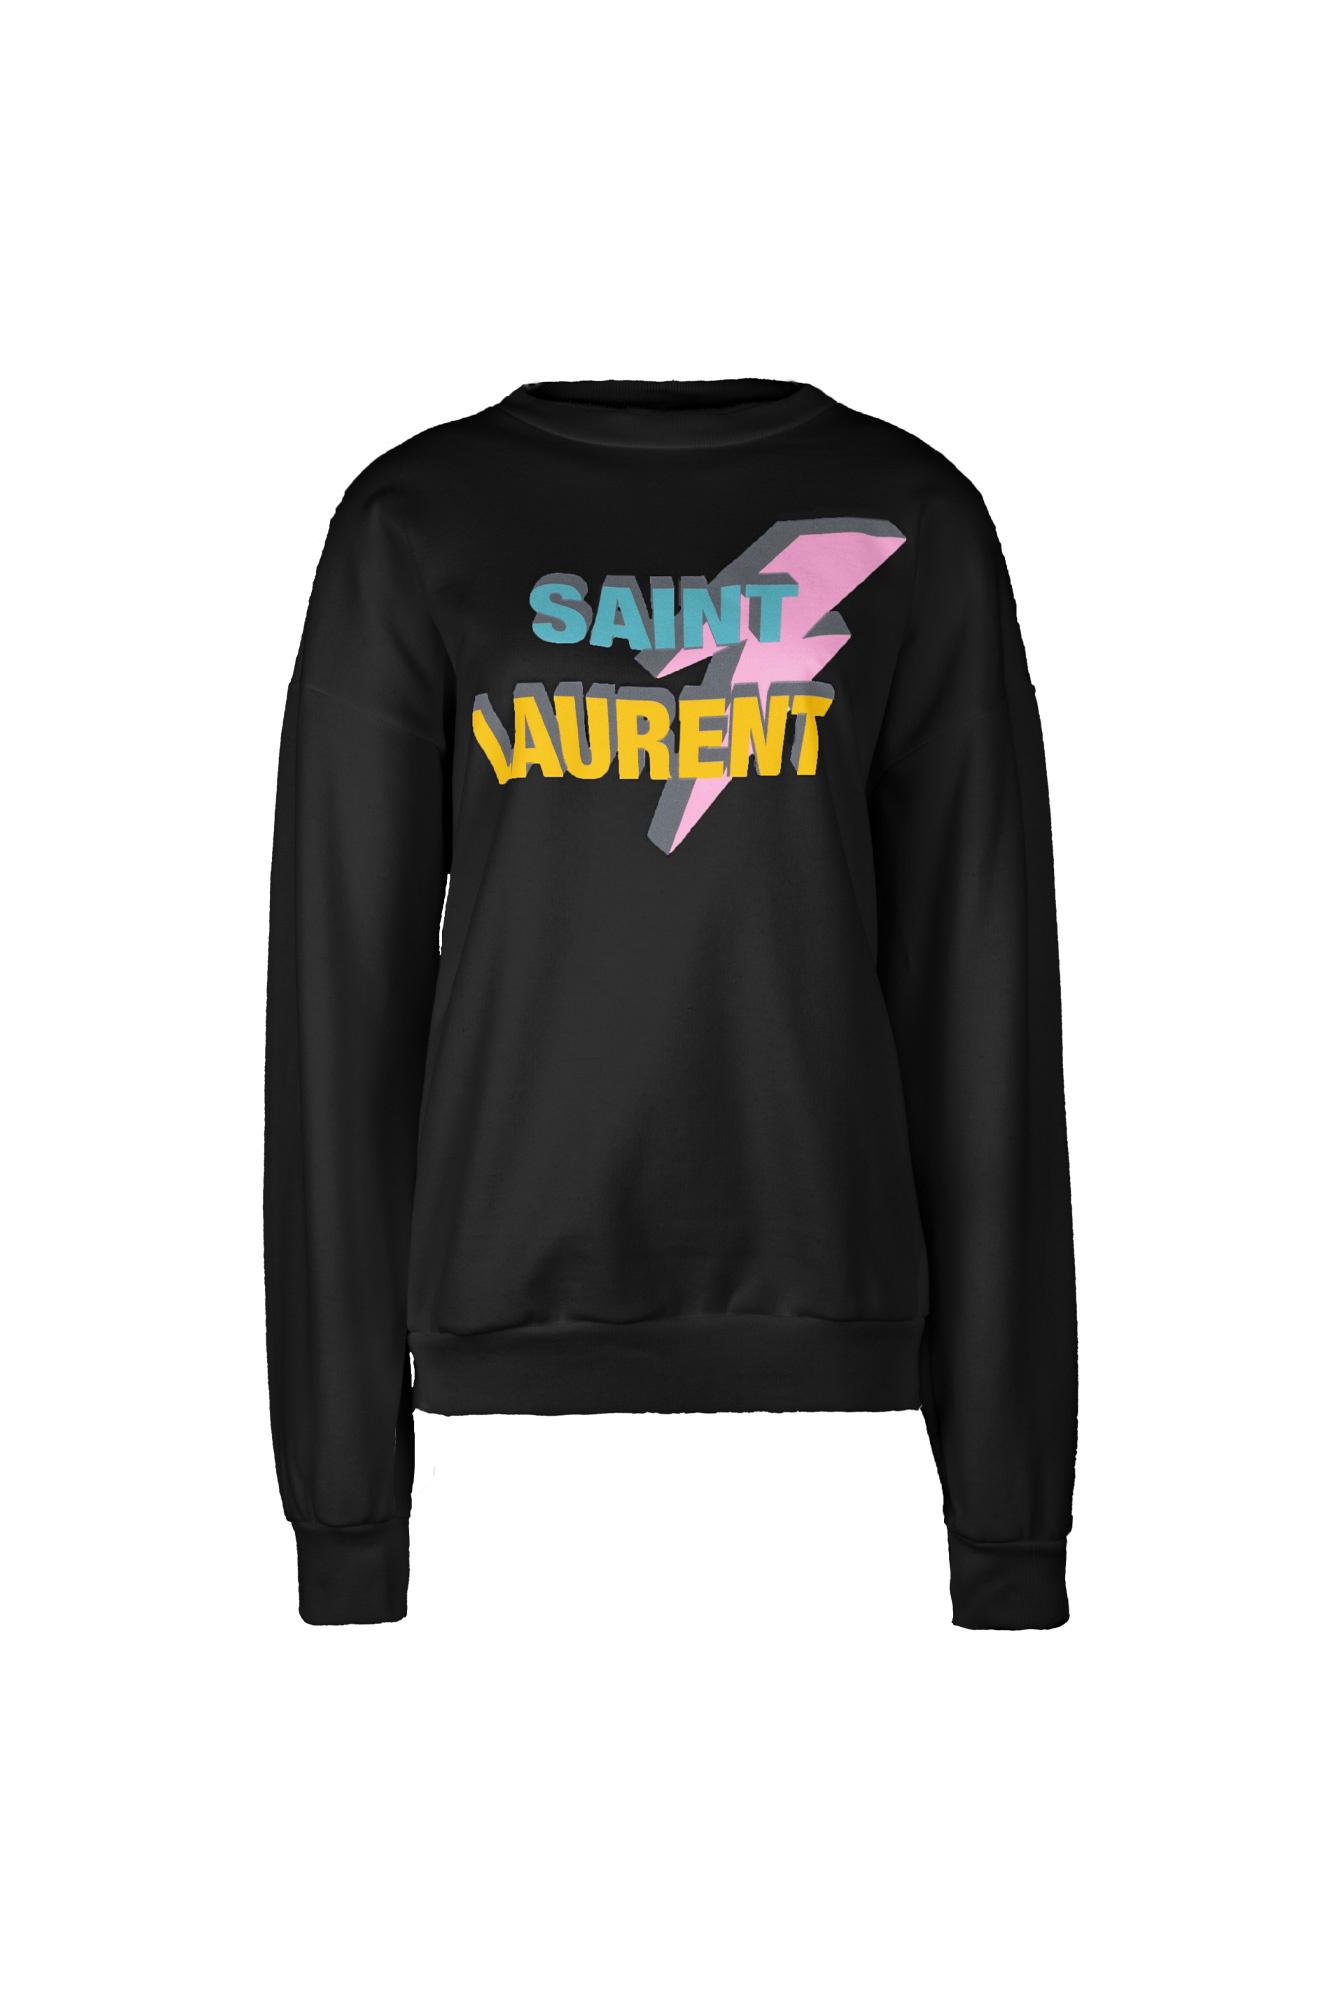 Saint sweater black